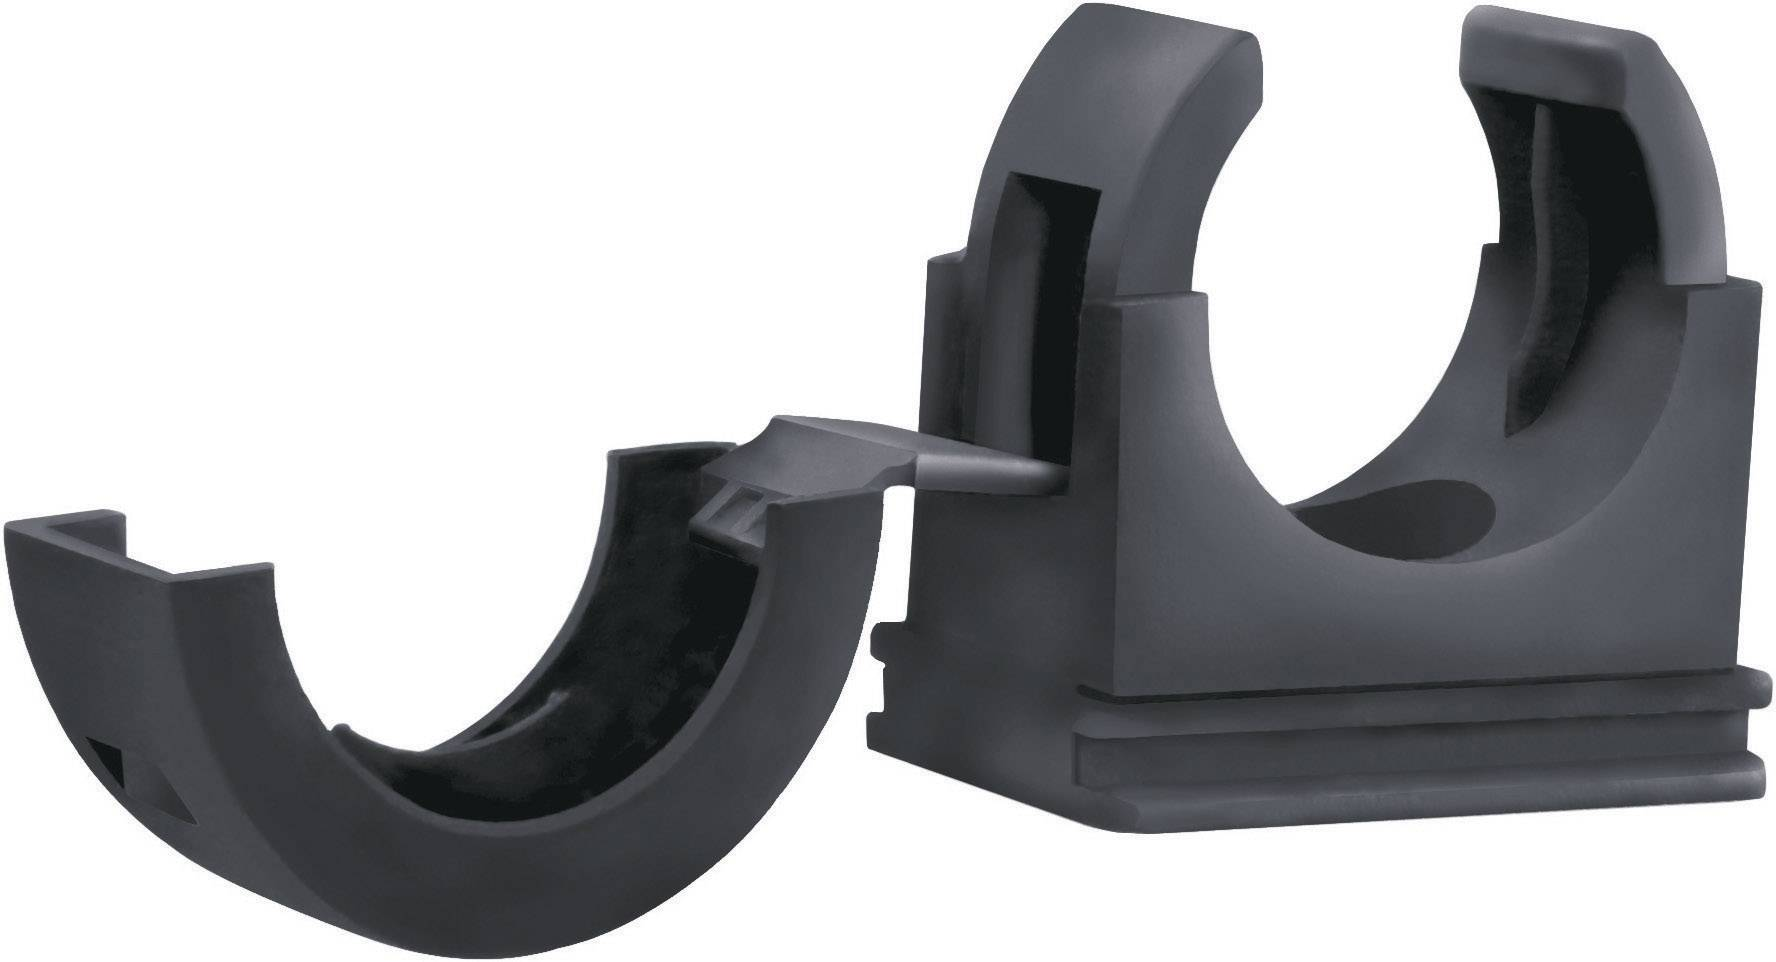 LappKabel SILVYN® FCL 28 55506945, 22.80 mm, čierna, 1 ks